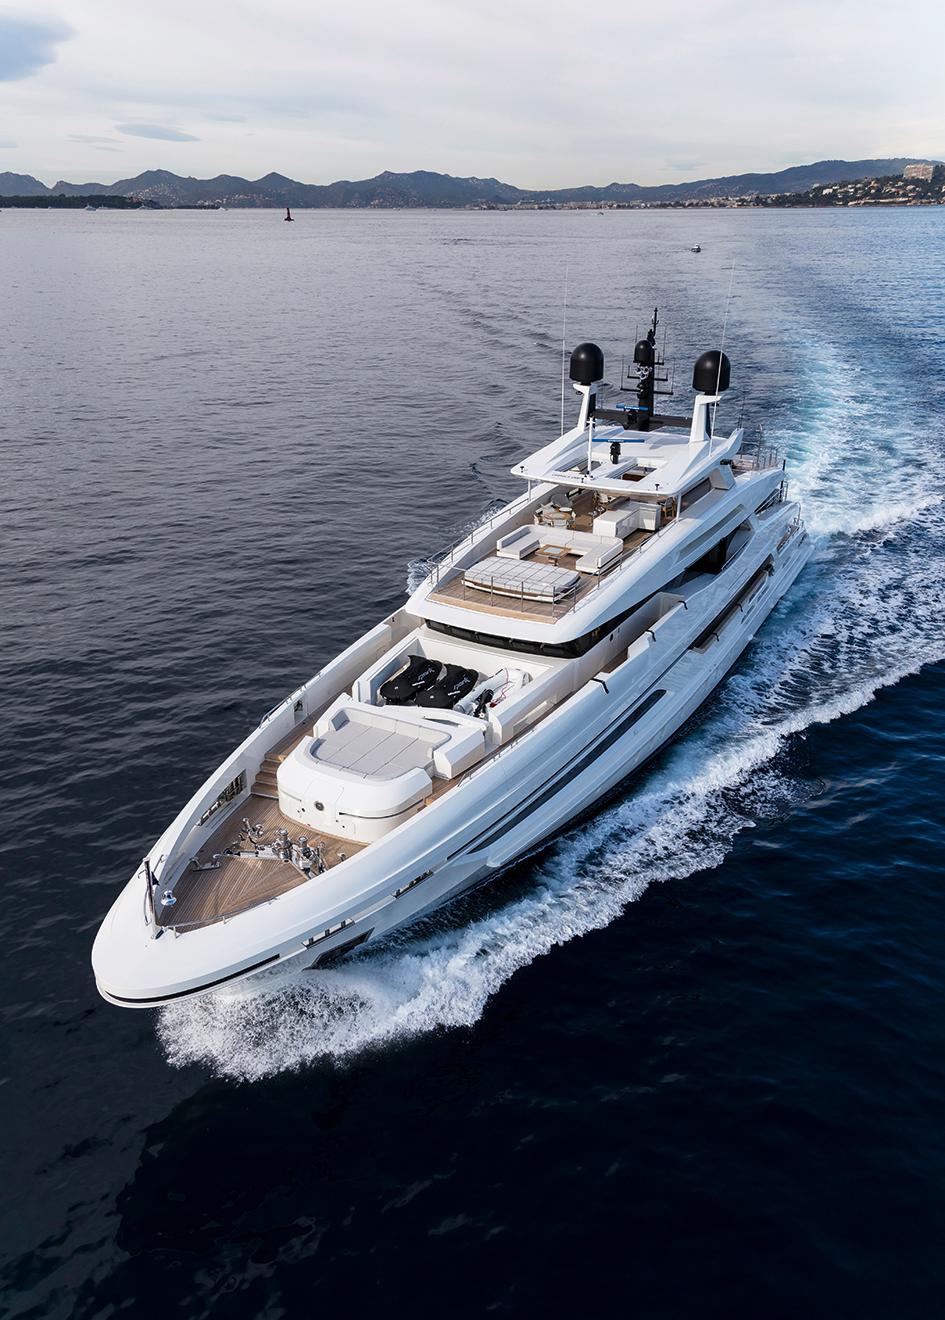 bow-running-shot-of-the-baglietto-motor-yacht-andiamo-credit-emilio-bianchi